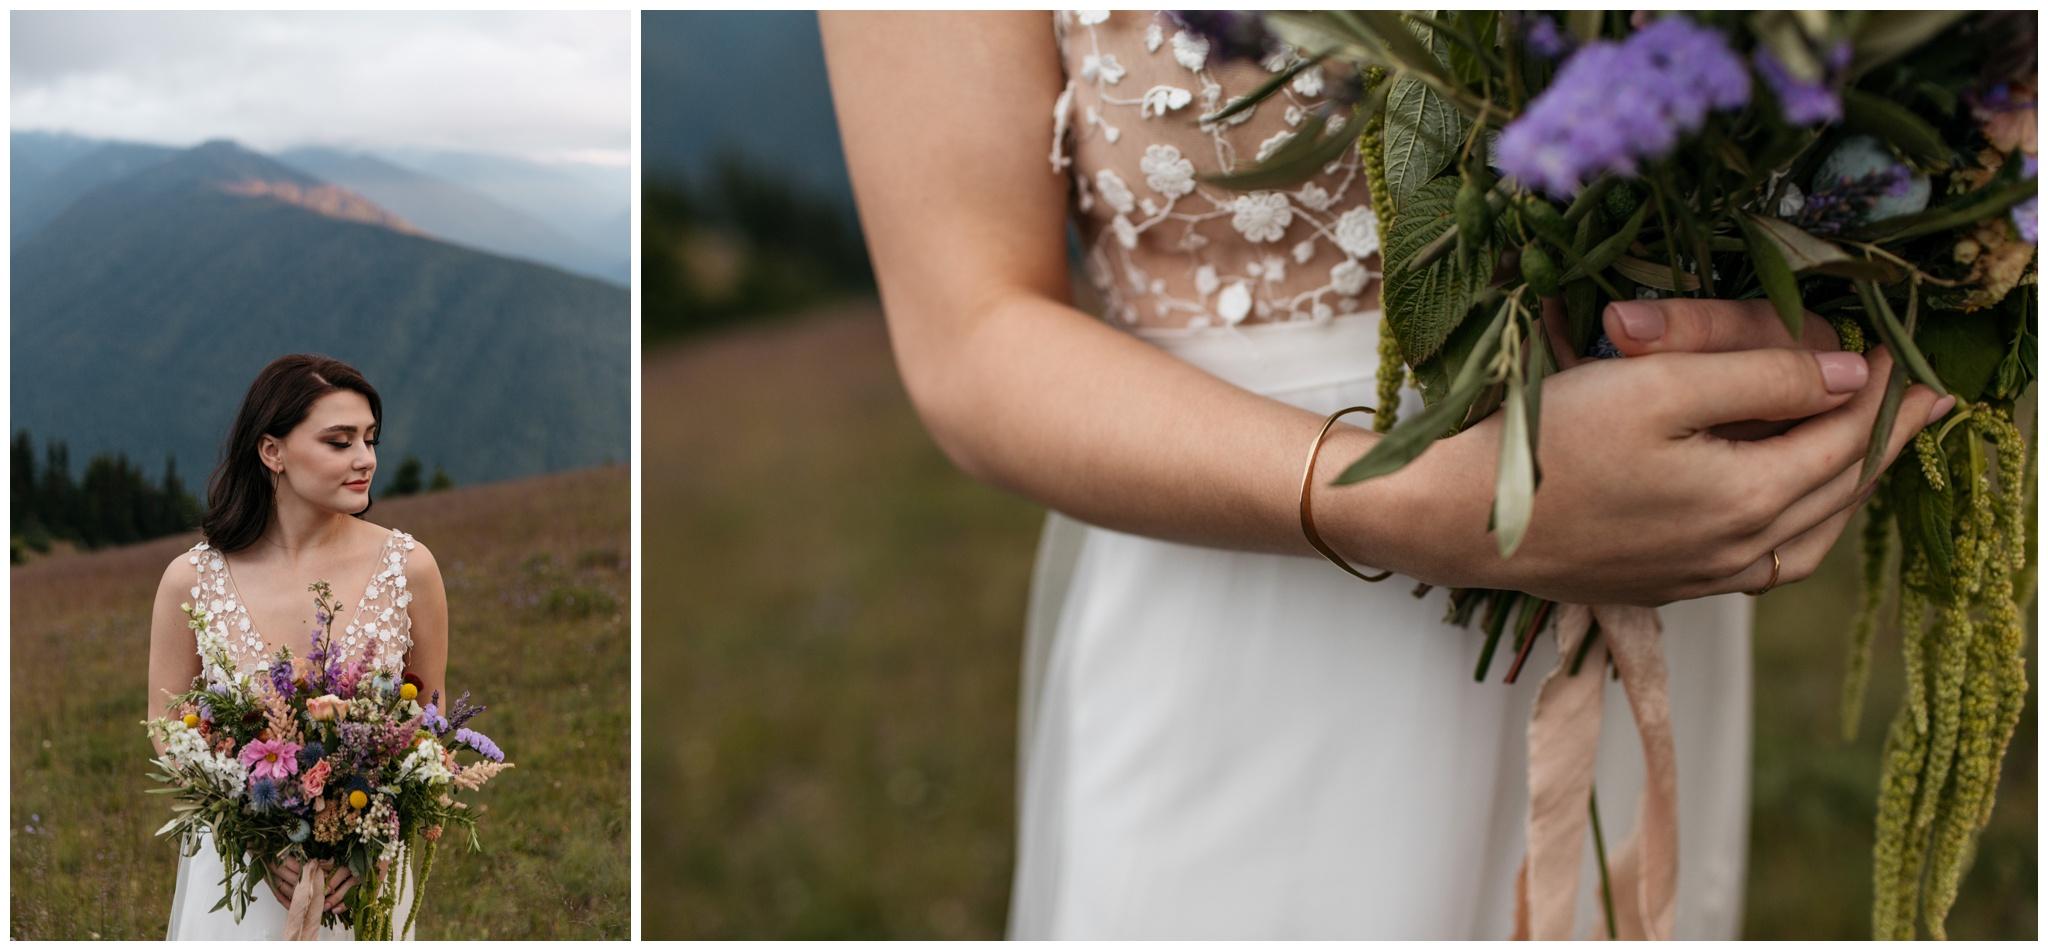 Intimate wildflower summer solstice wedding at Eberle Barn on Olympic Peninsula